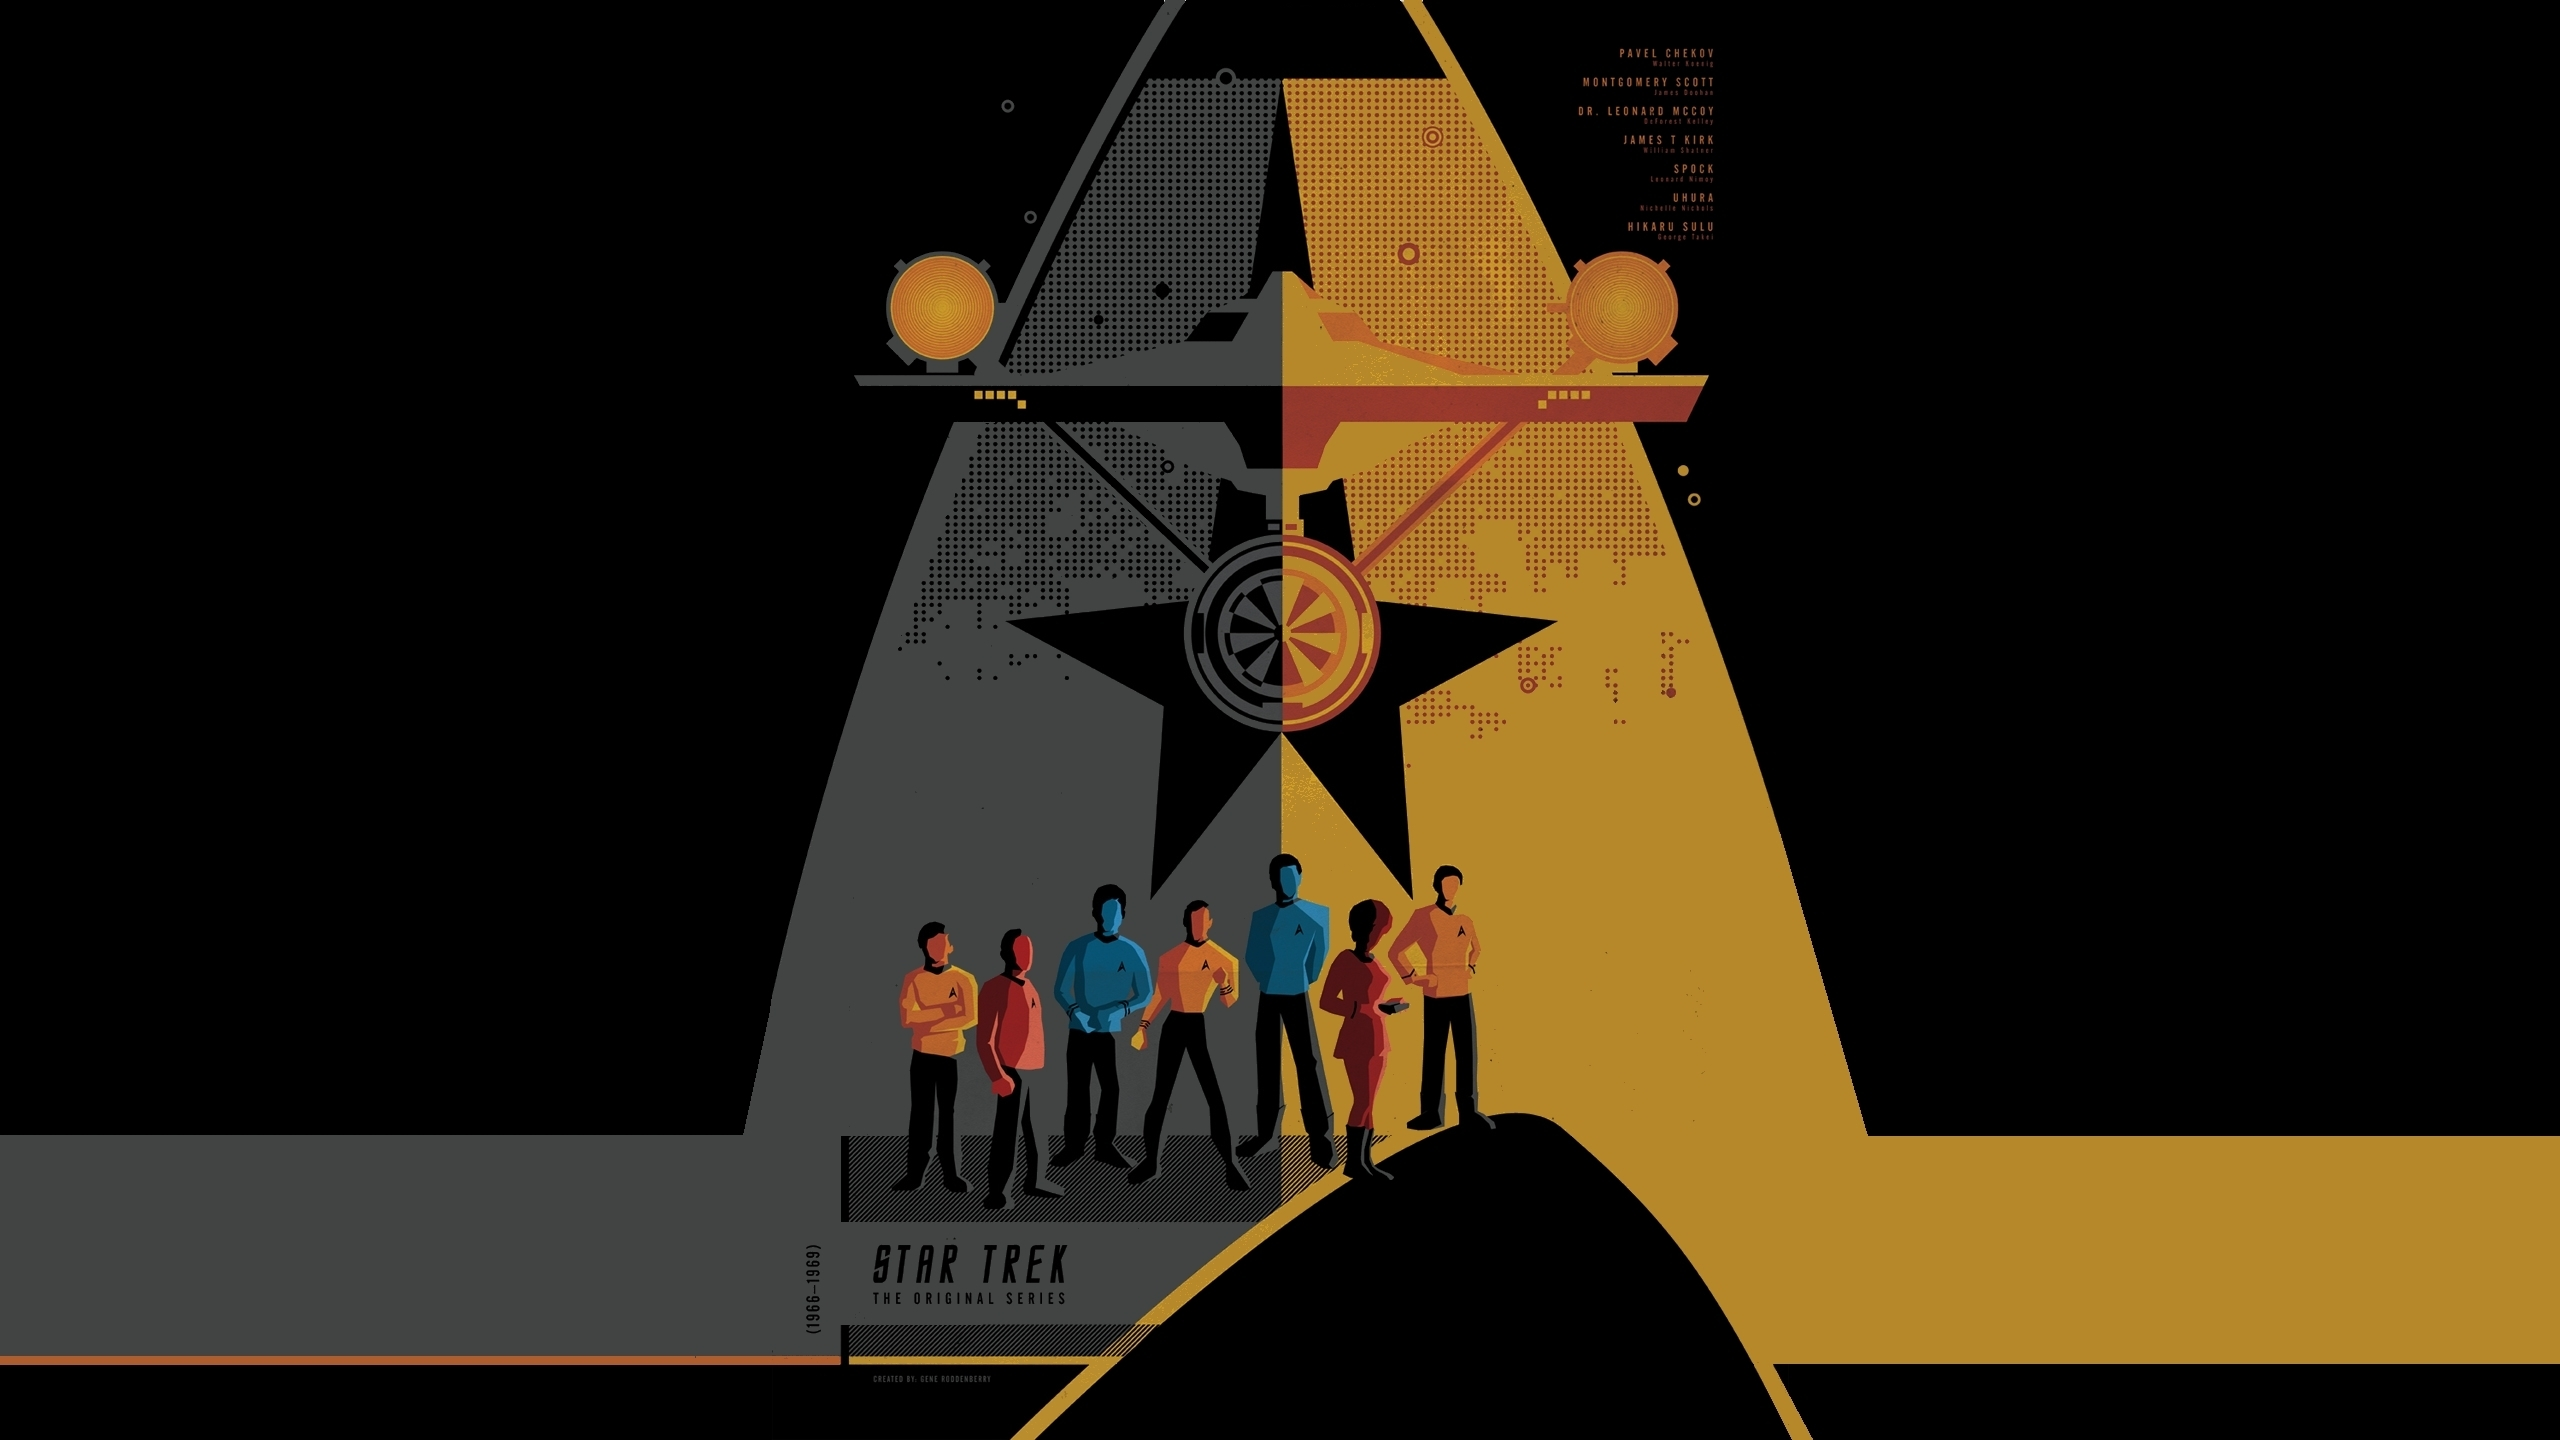 star trek: the original series full hd wallpaper and background